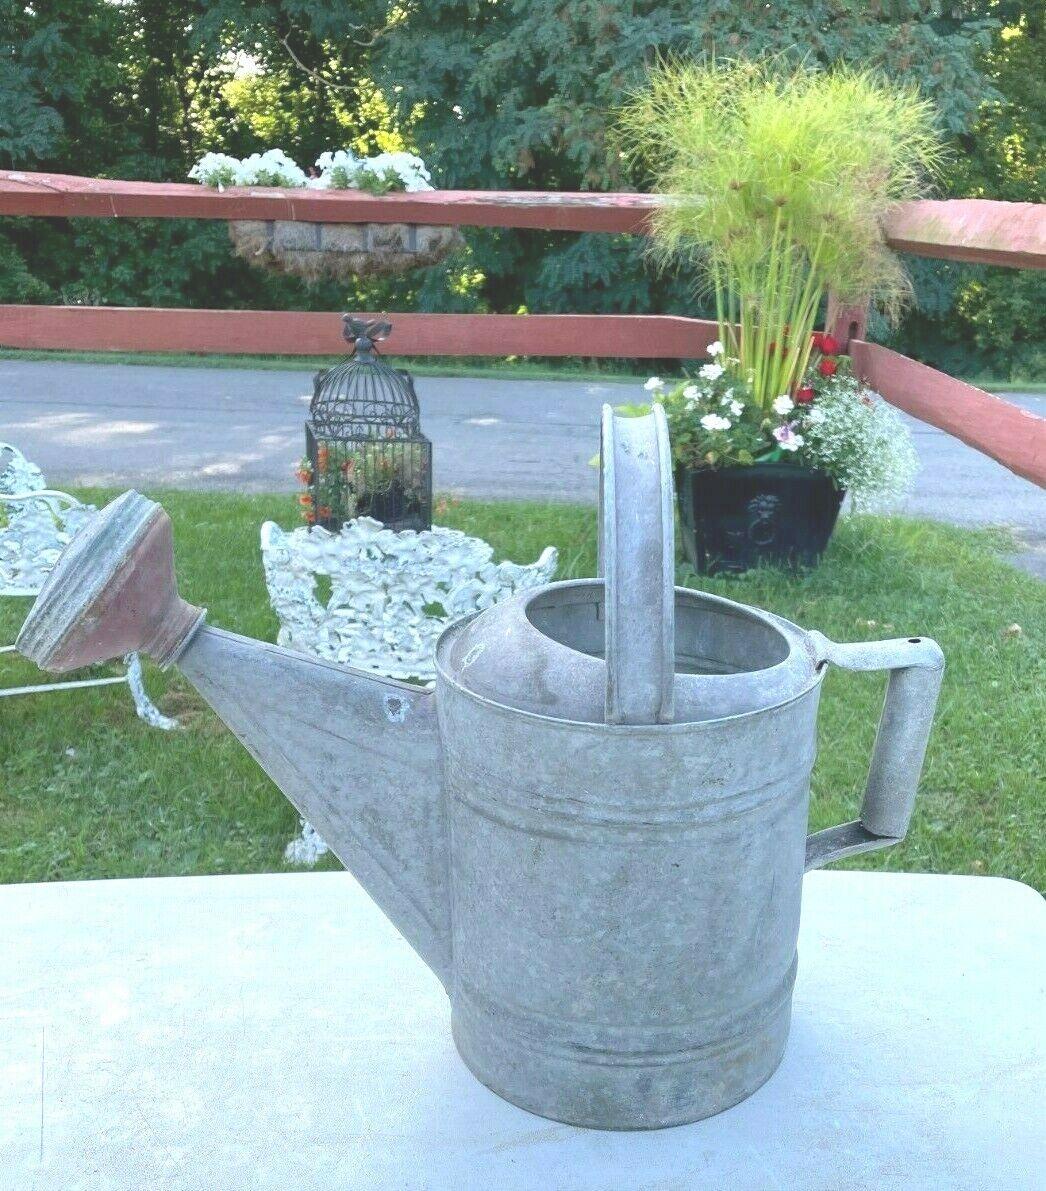 Rustic Vintage Antique Galvanized Watering Can w/Sprinkler Head (D)